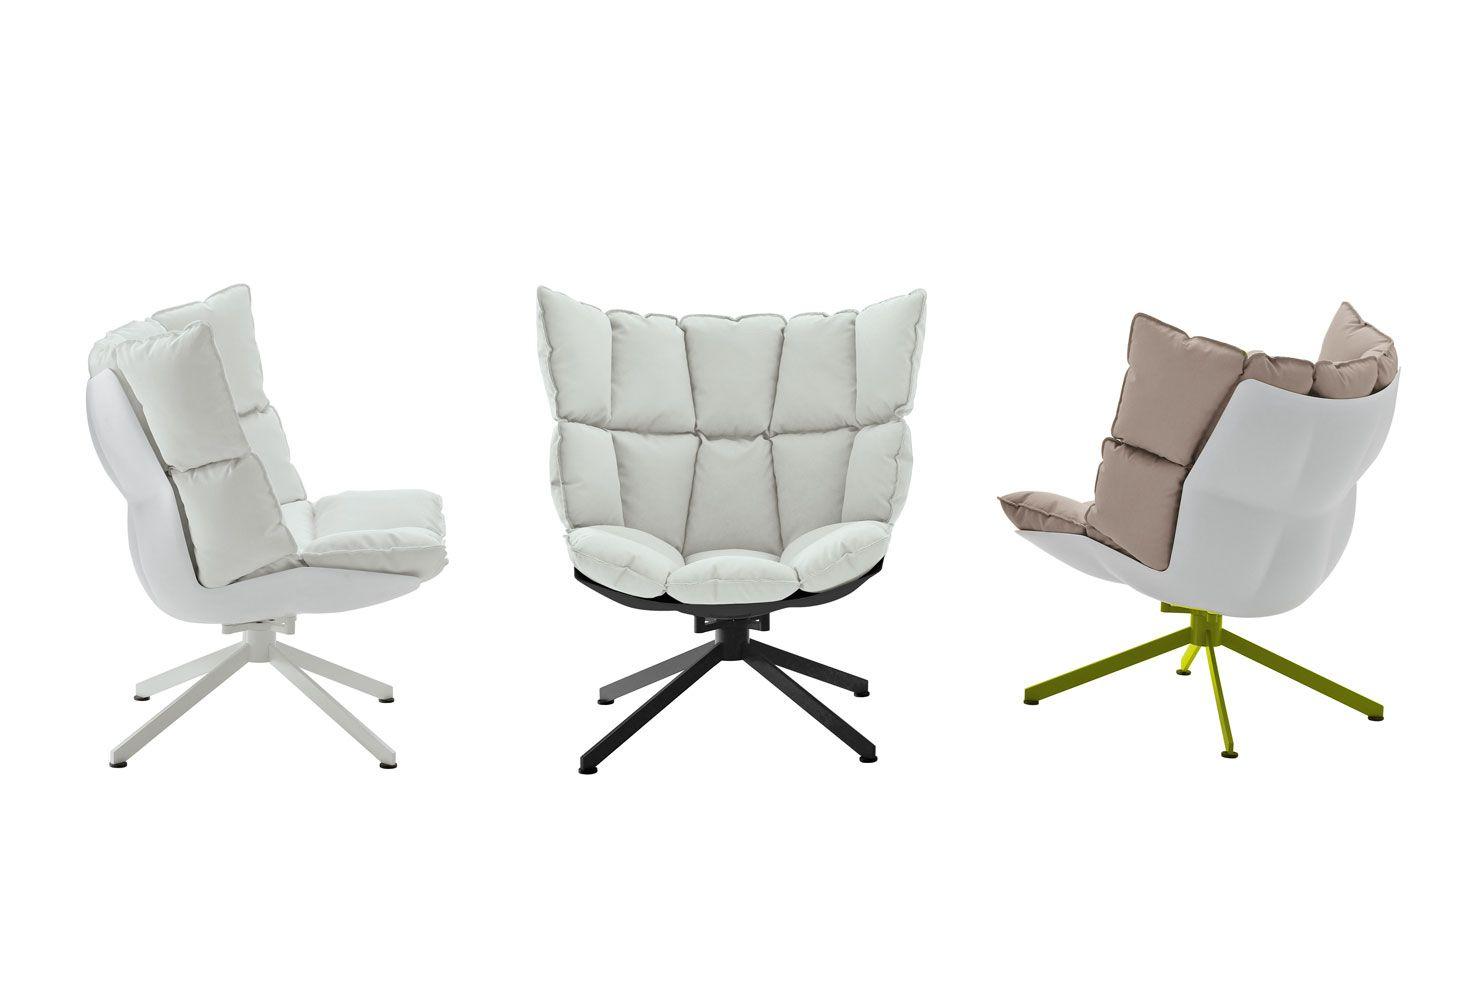 Husk Armchair By B B Italia Pinworthy Chairs We Love At Design Connection Inc Kansas City Interior Design Http Www Patricia Urquiola B B Italia Armchair